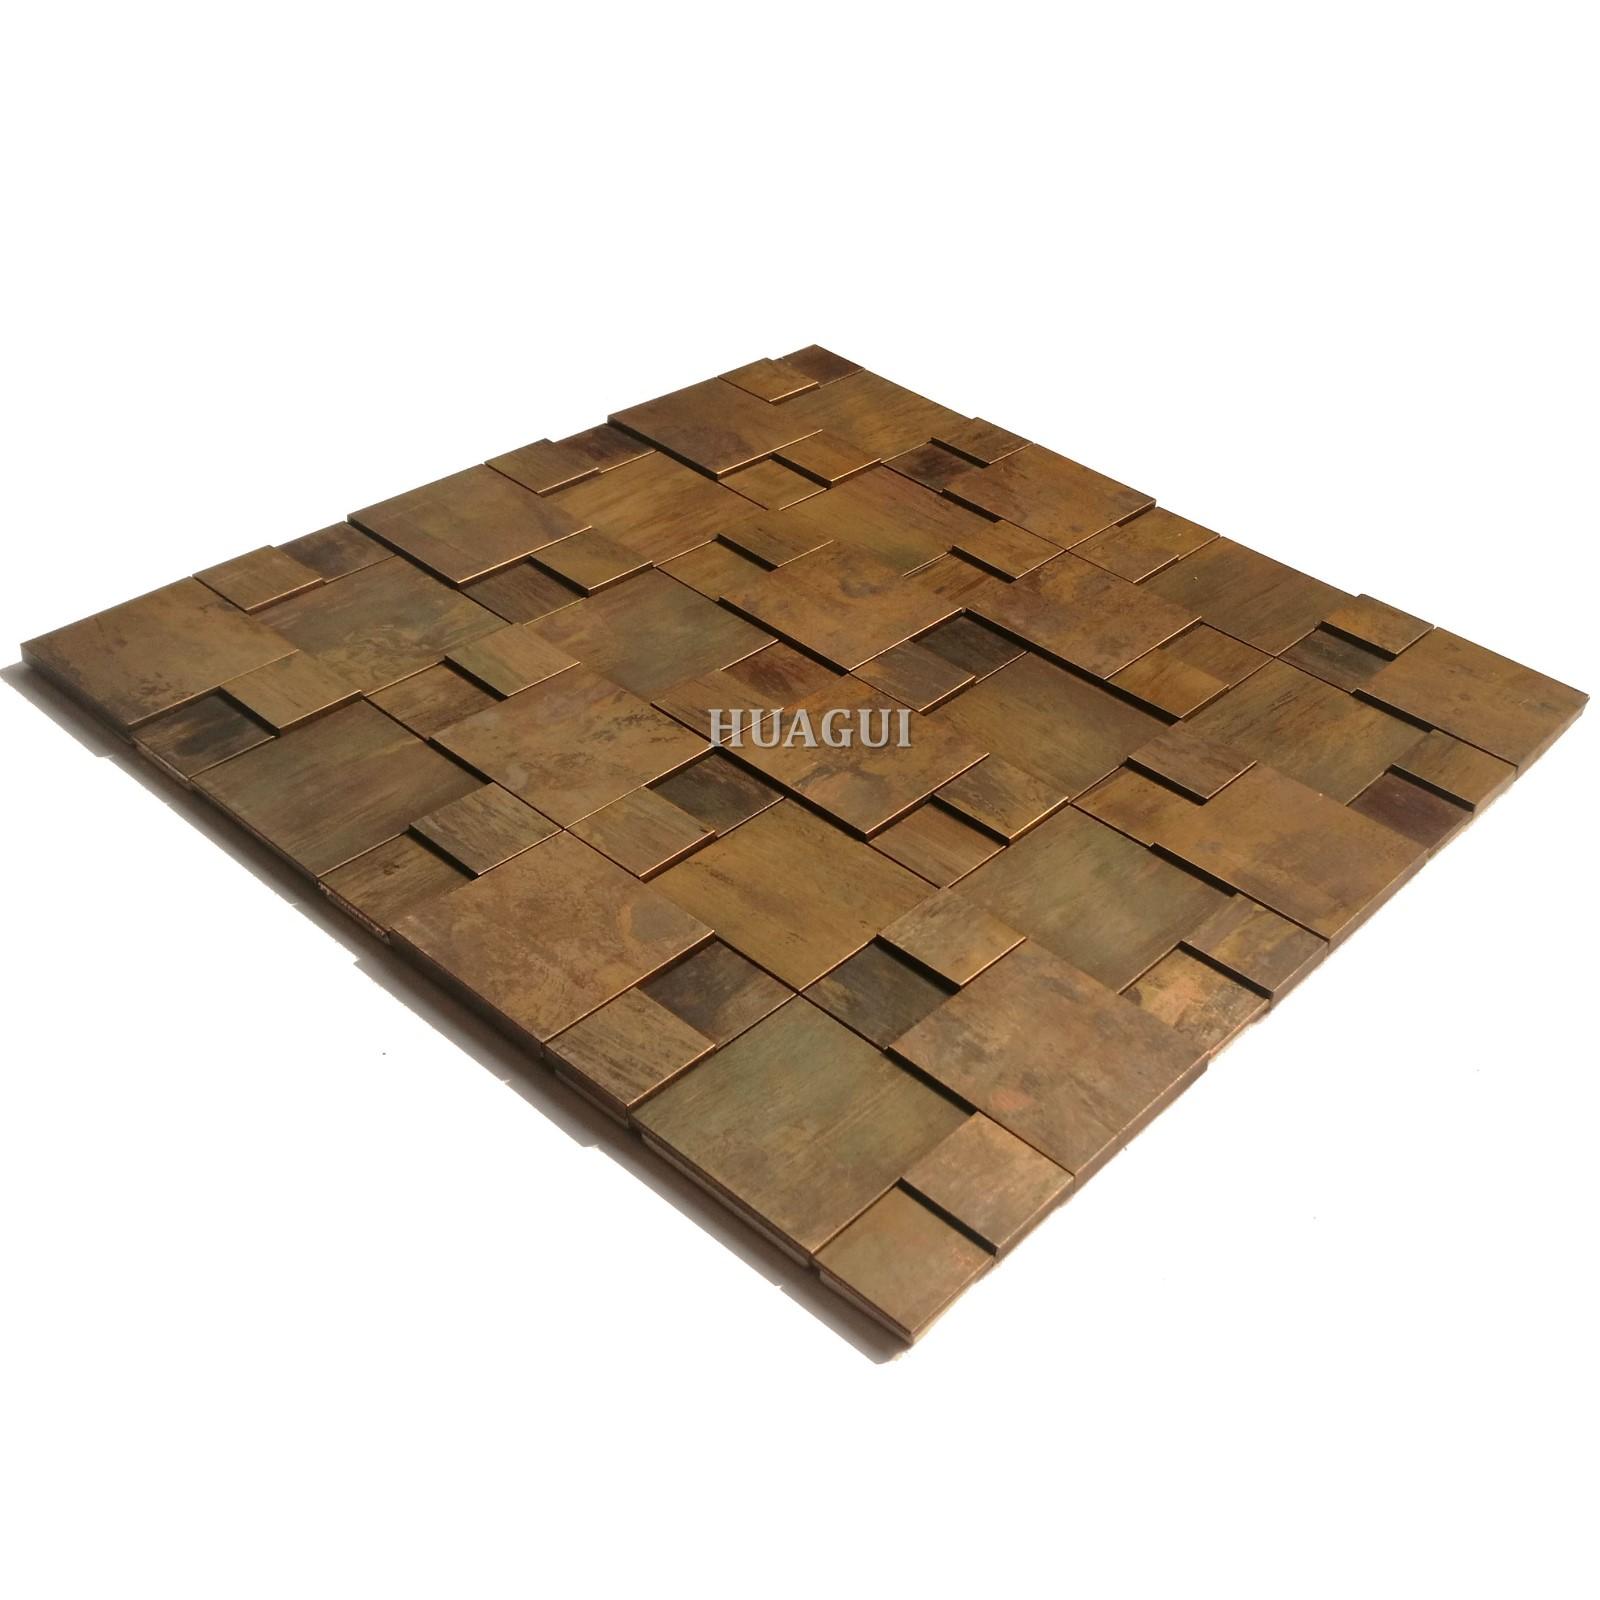 Huagui bronze copper mosaic tile company for home-1